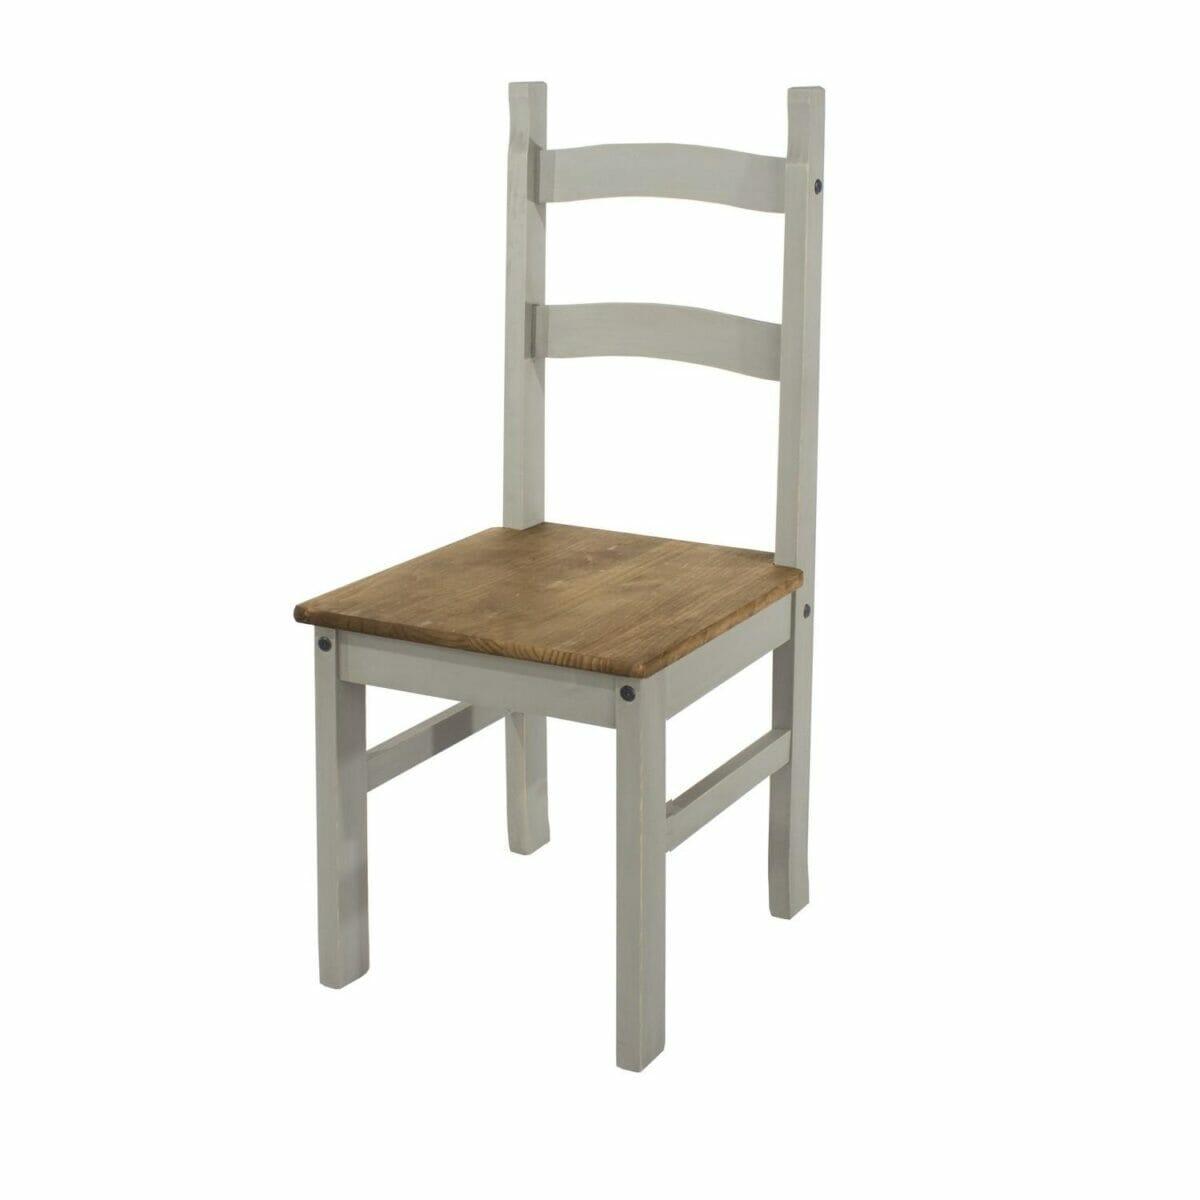 Corona Grey Pine Solid Pine Chairs (Pair)